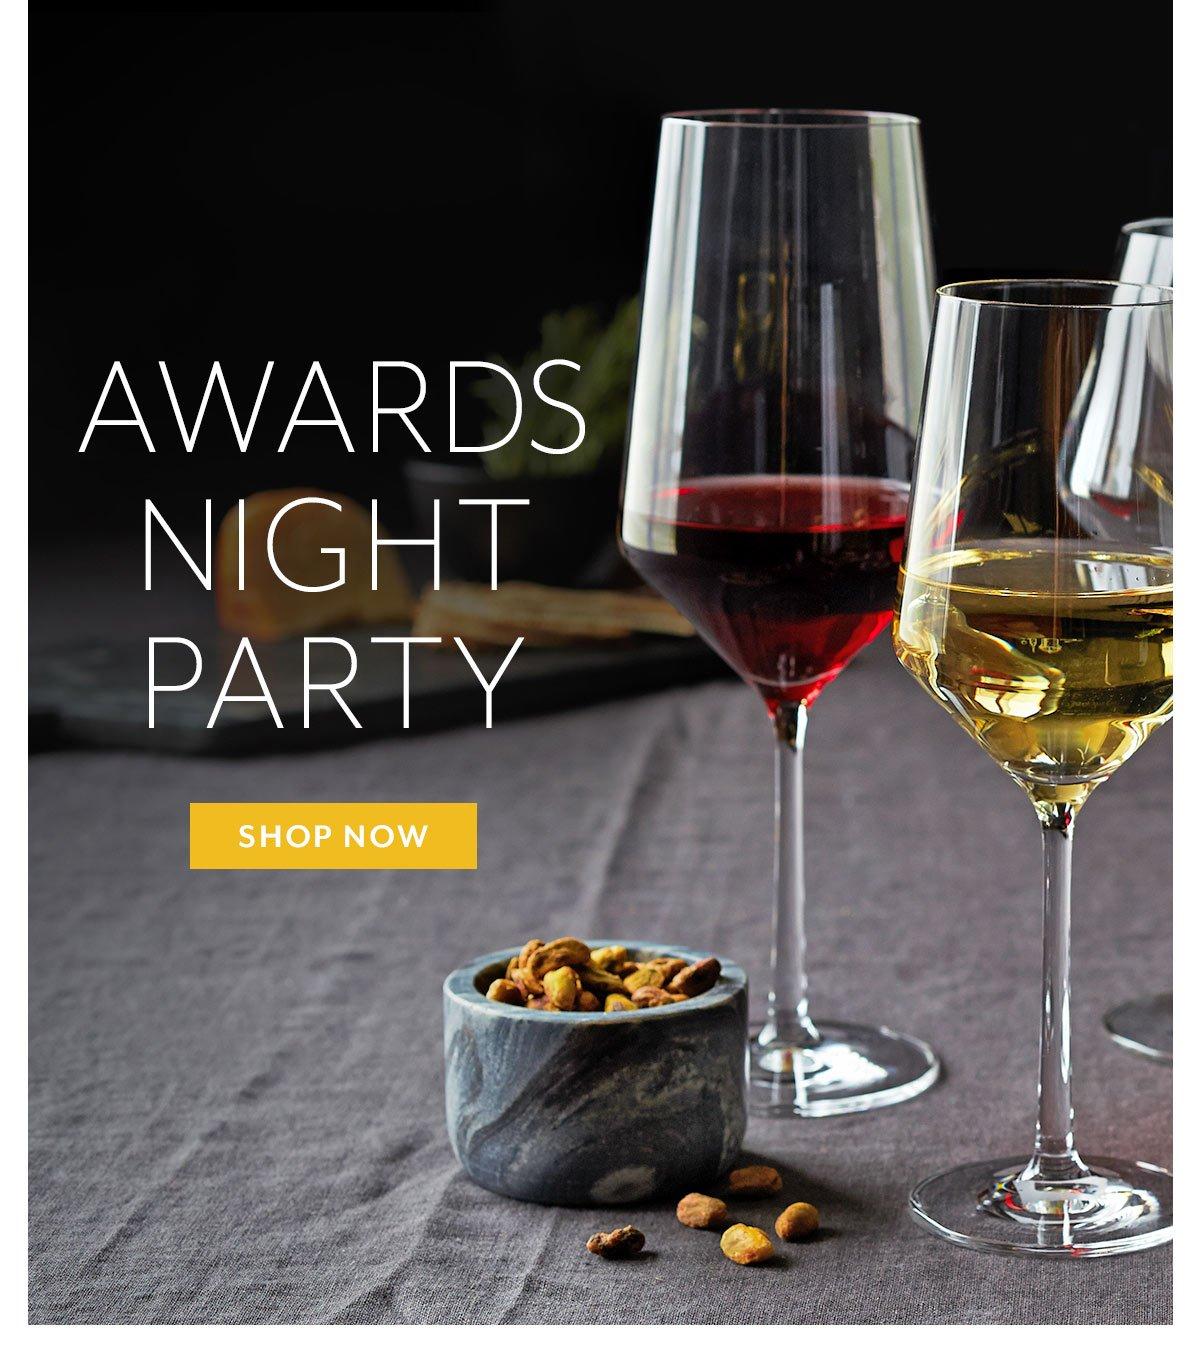 Awards Night Party